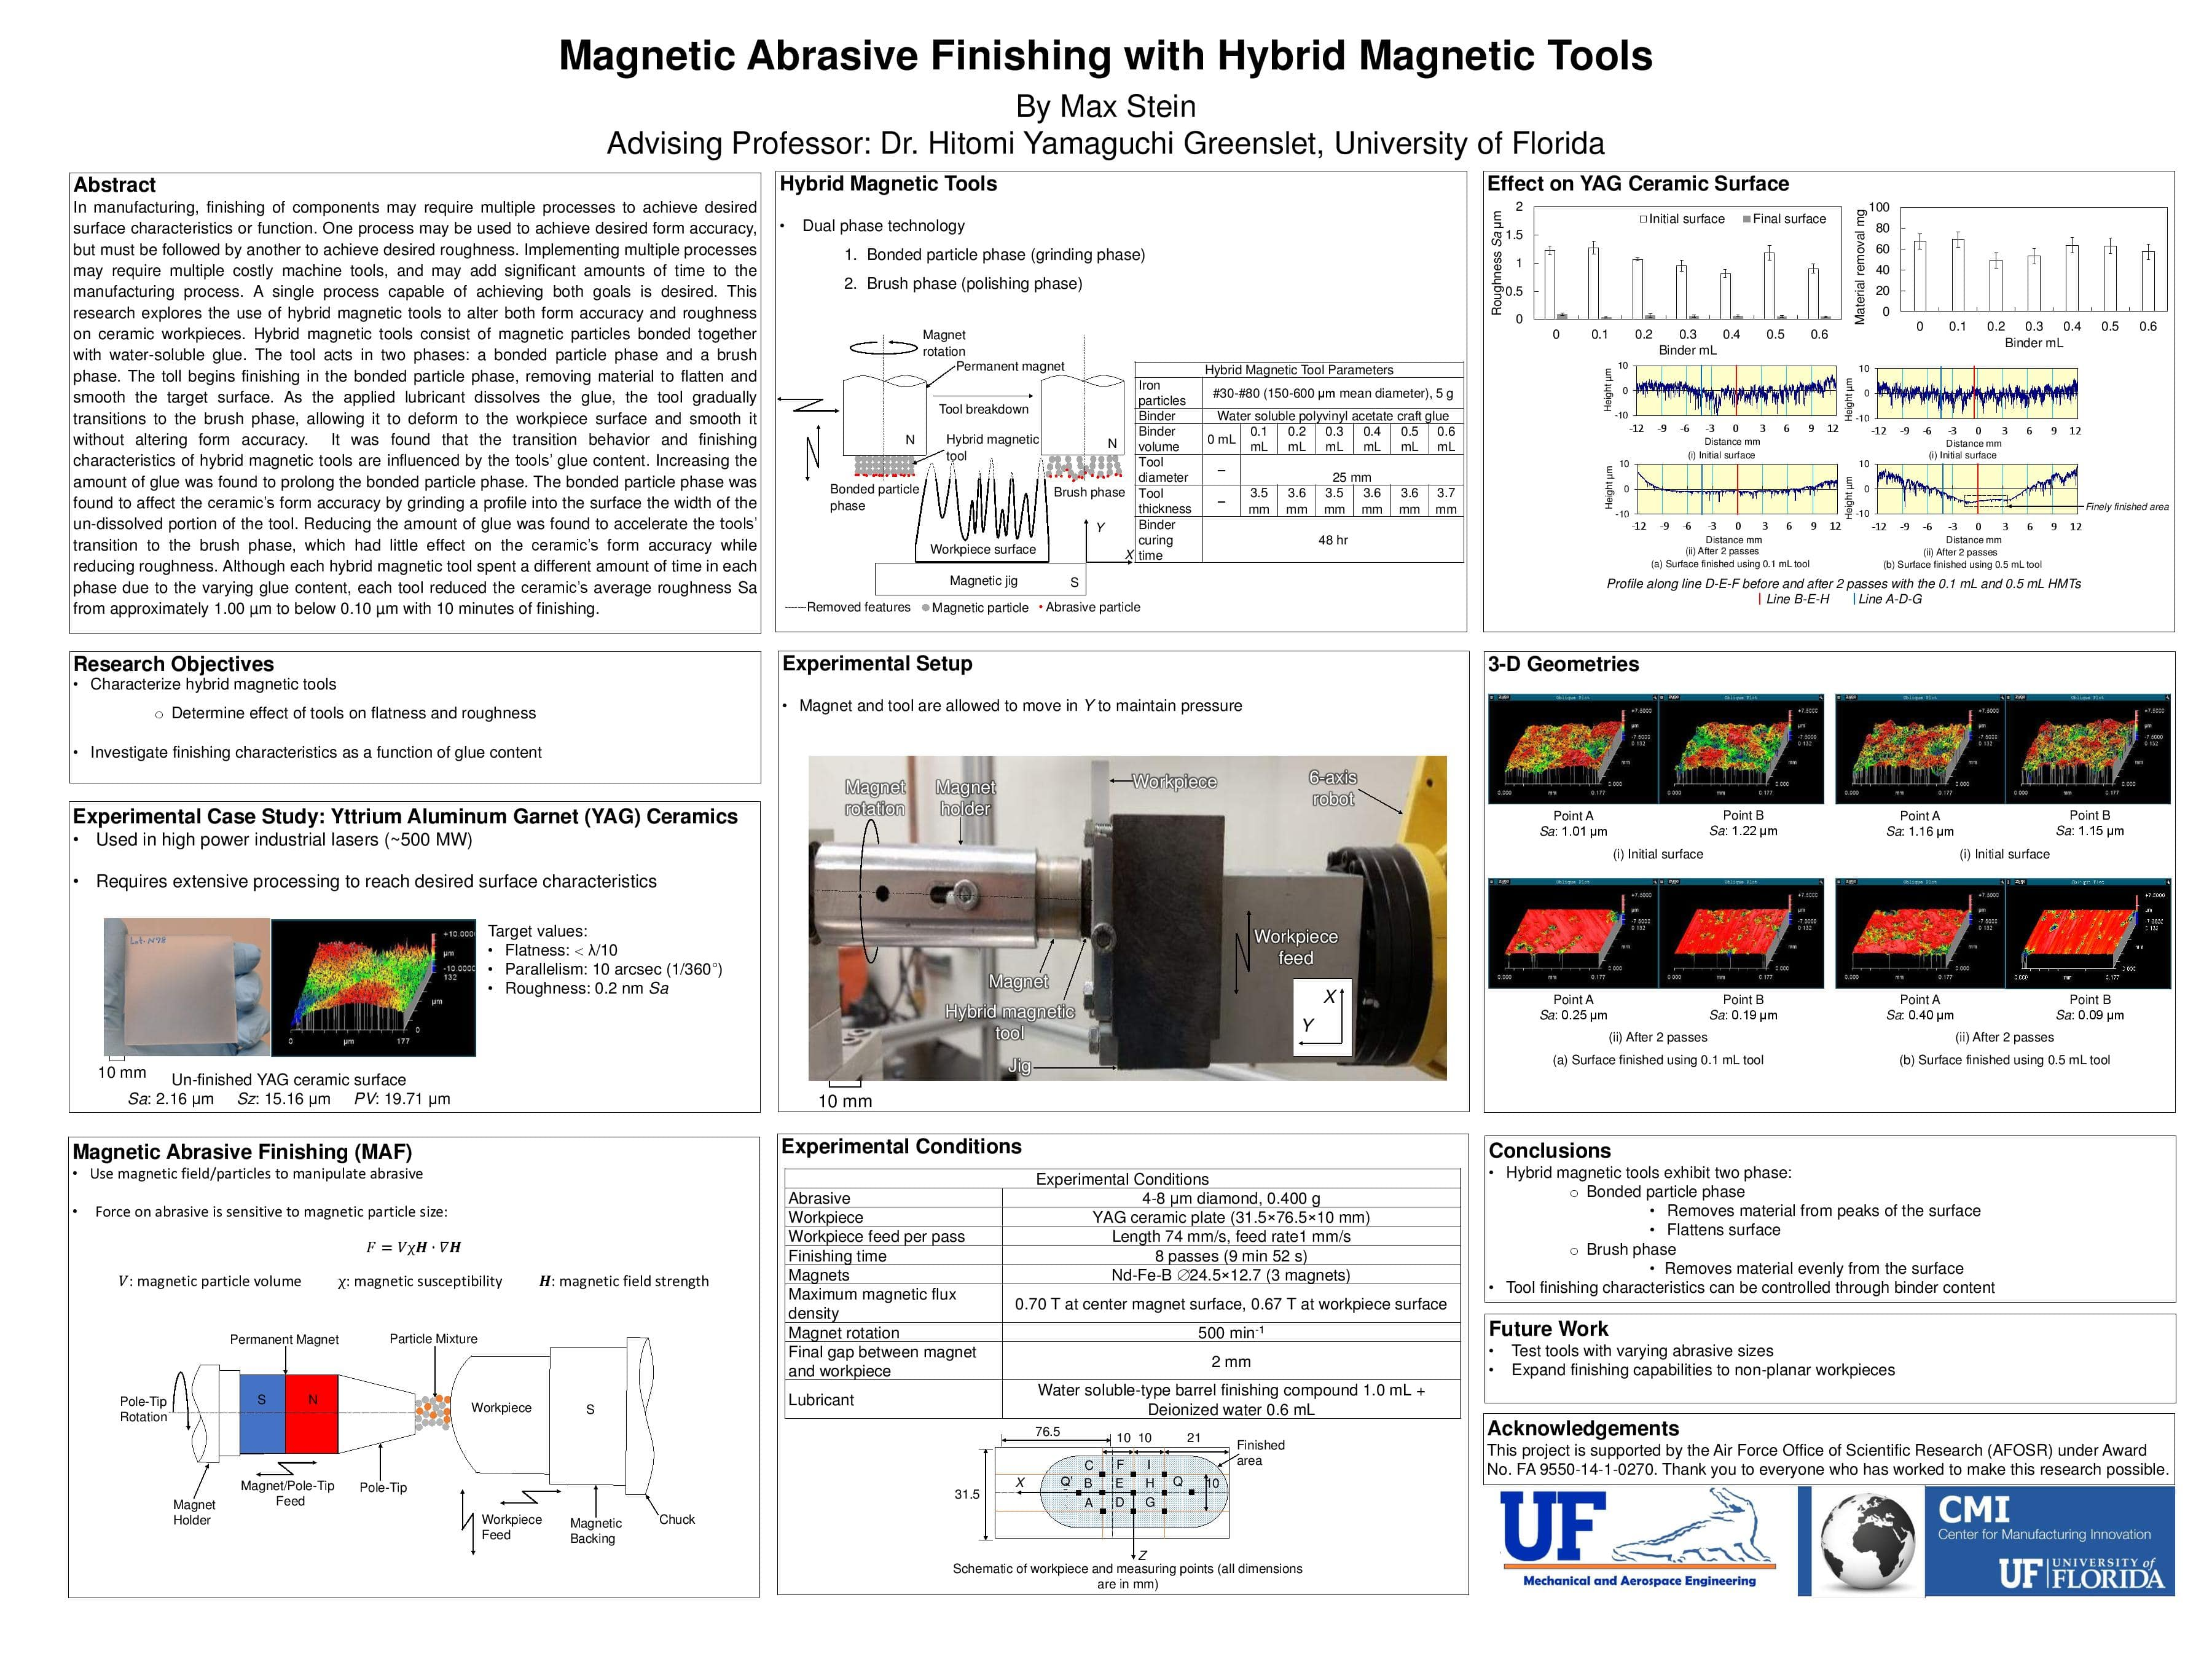 optimization of magnetic abrasive finishing process